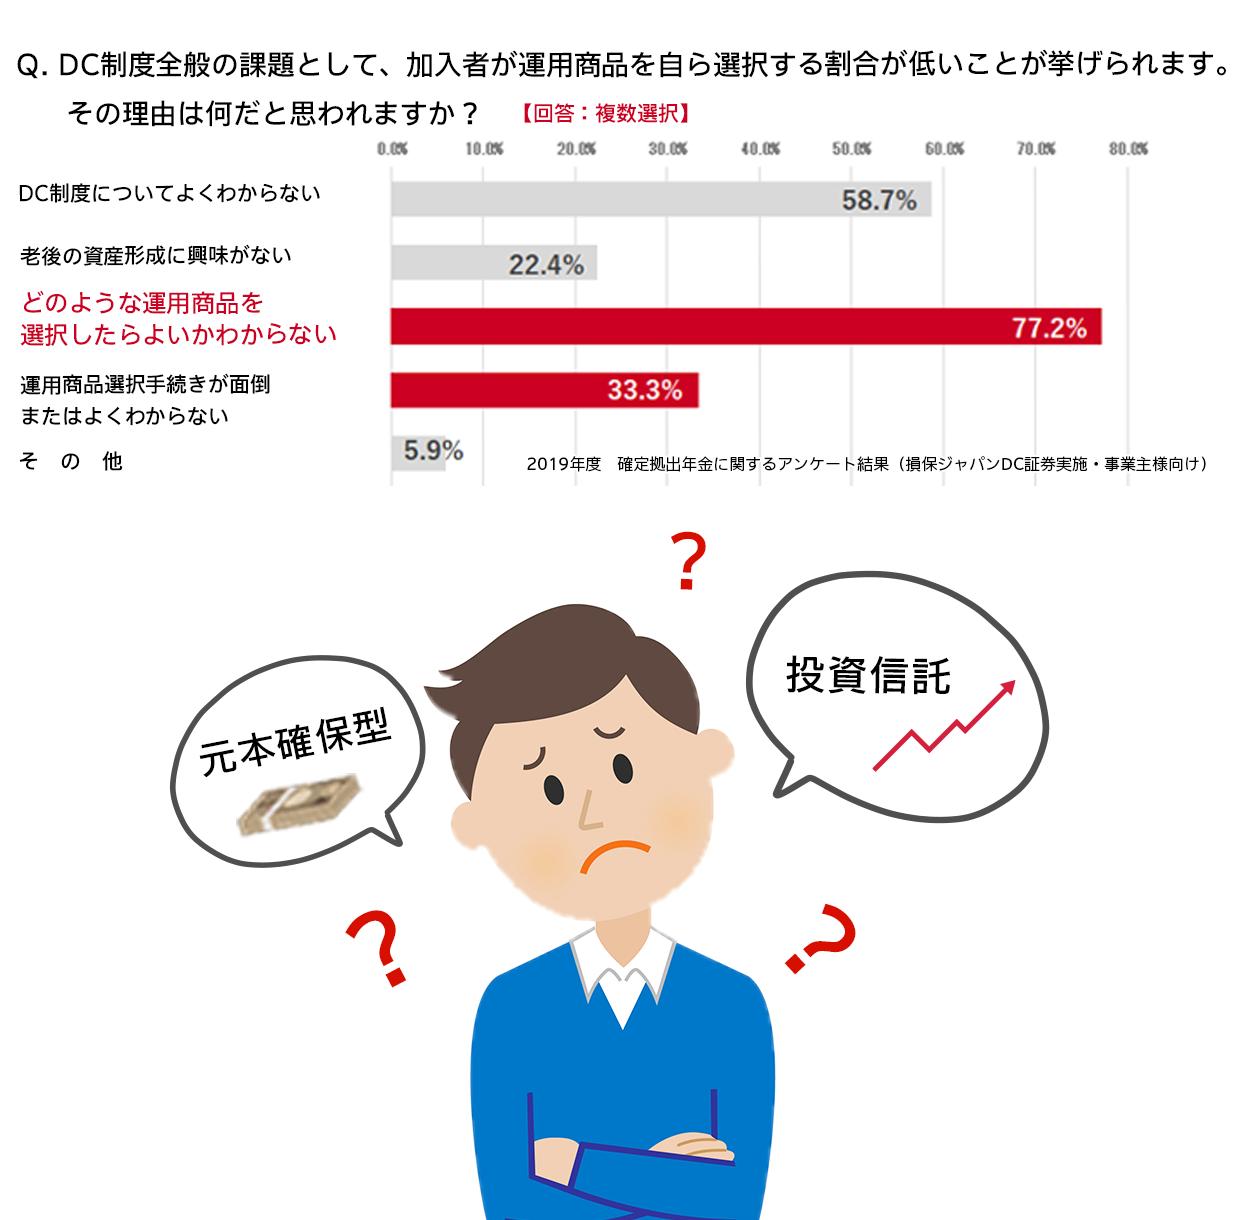 Dc 損保 ジャパン